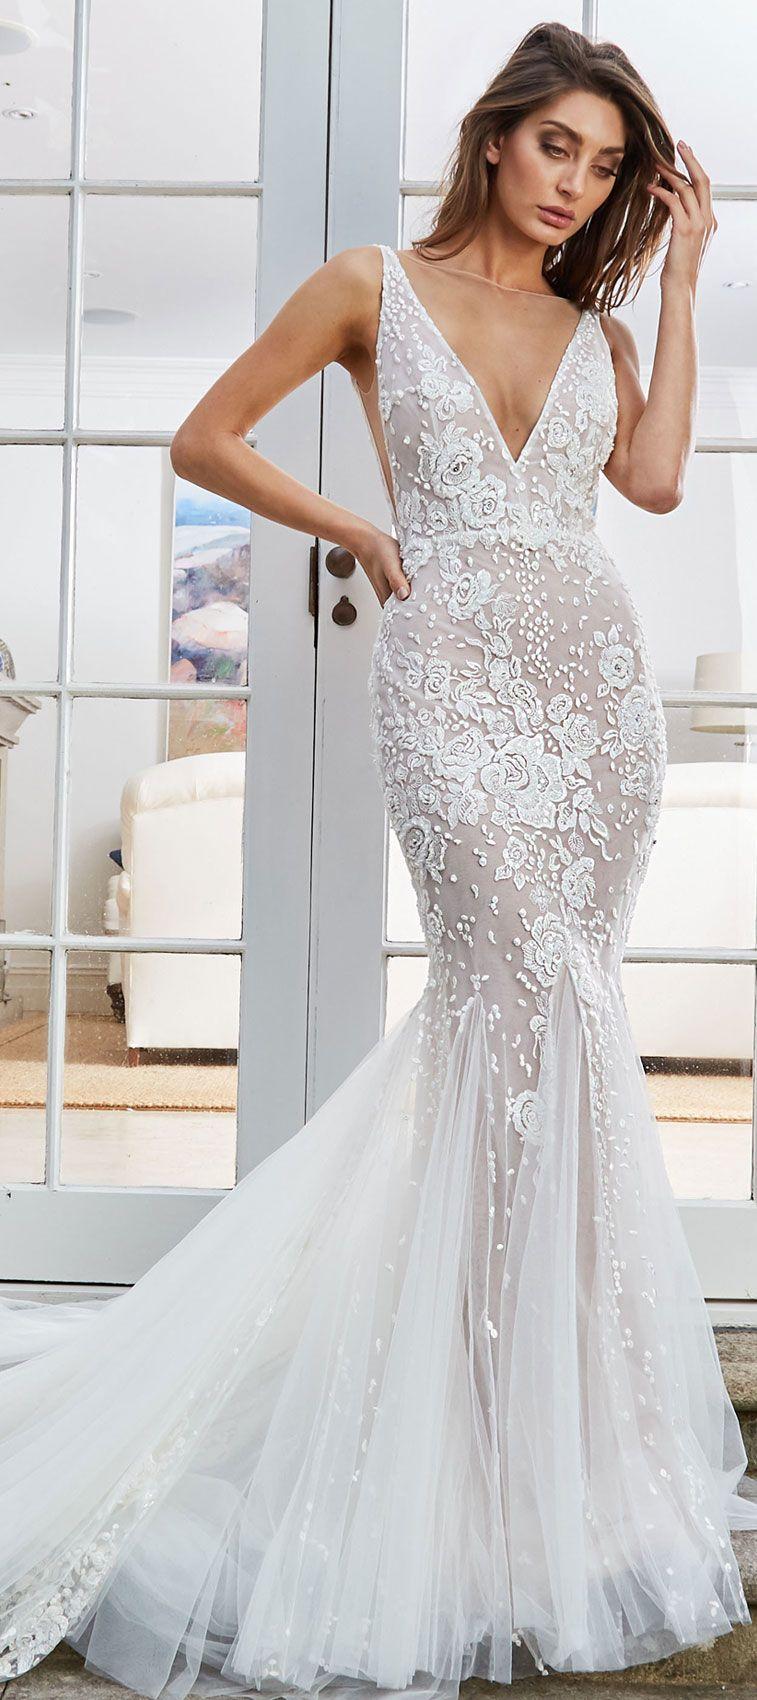 Wedding dress sleeveless embroidered deep v neck mermaid wedding gown swept train #wedding #weddingdress #bridedress